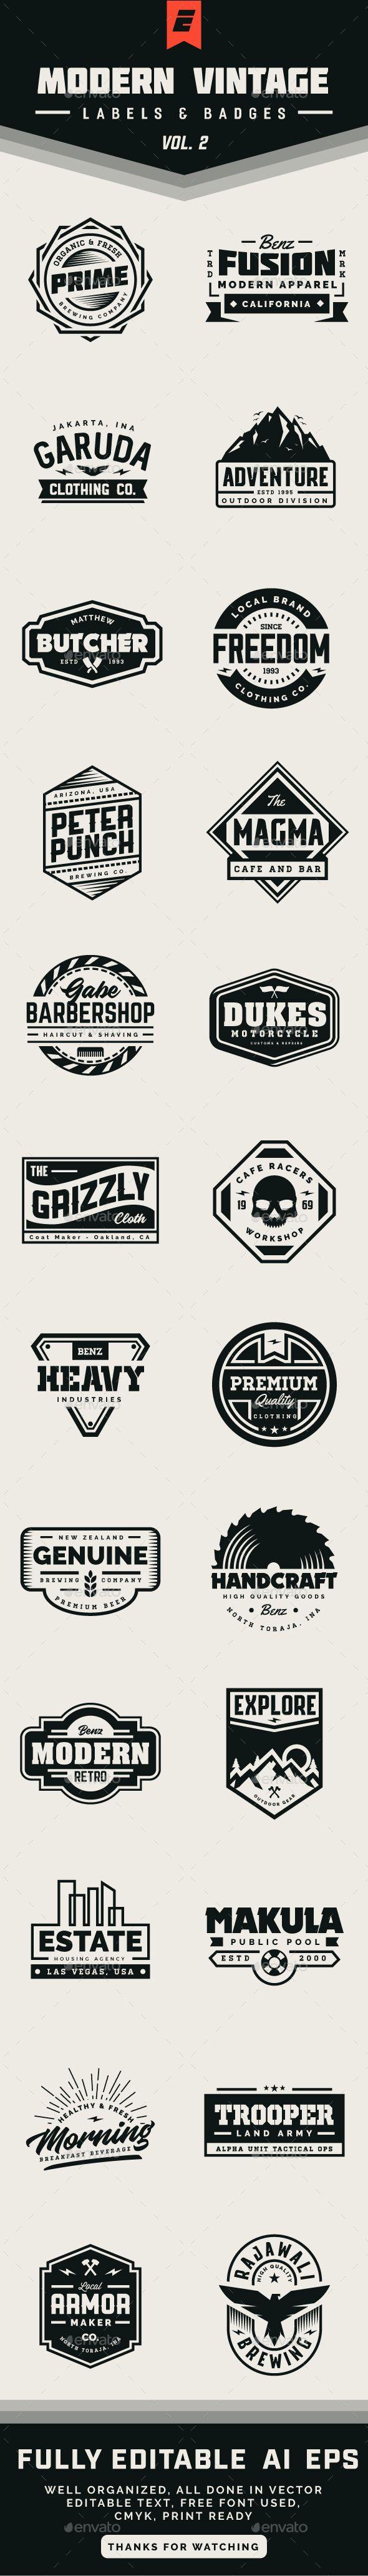 1119 best logos images on pinterest logo branding animales and